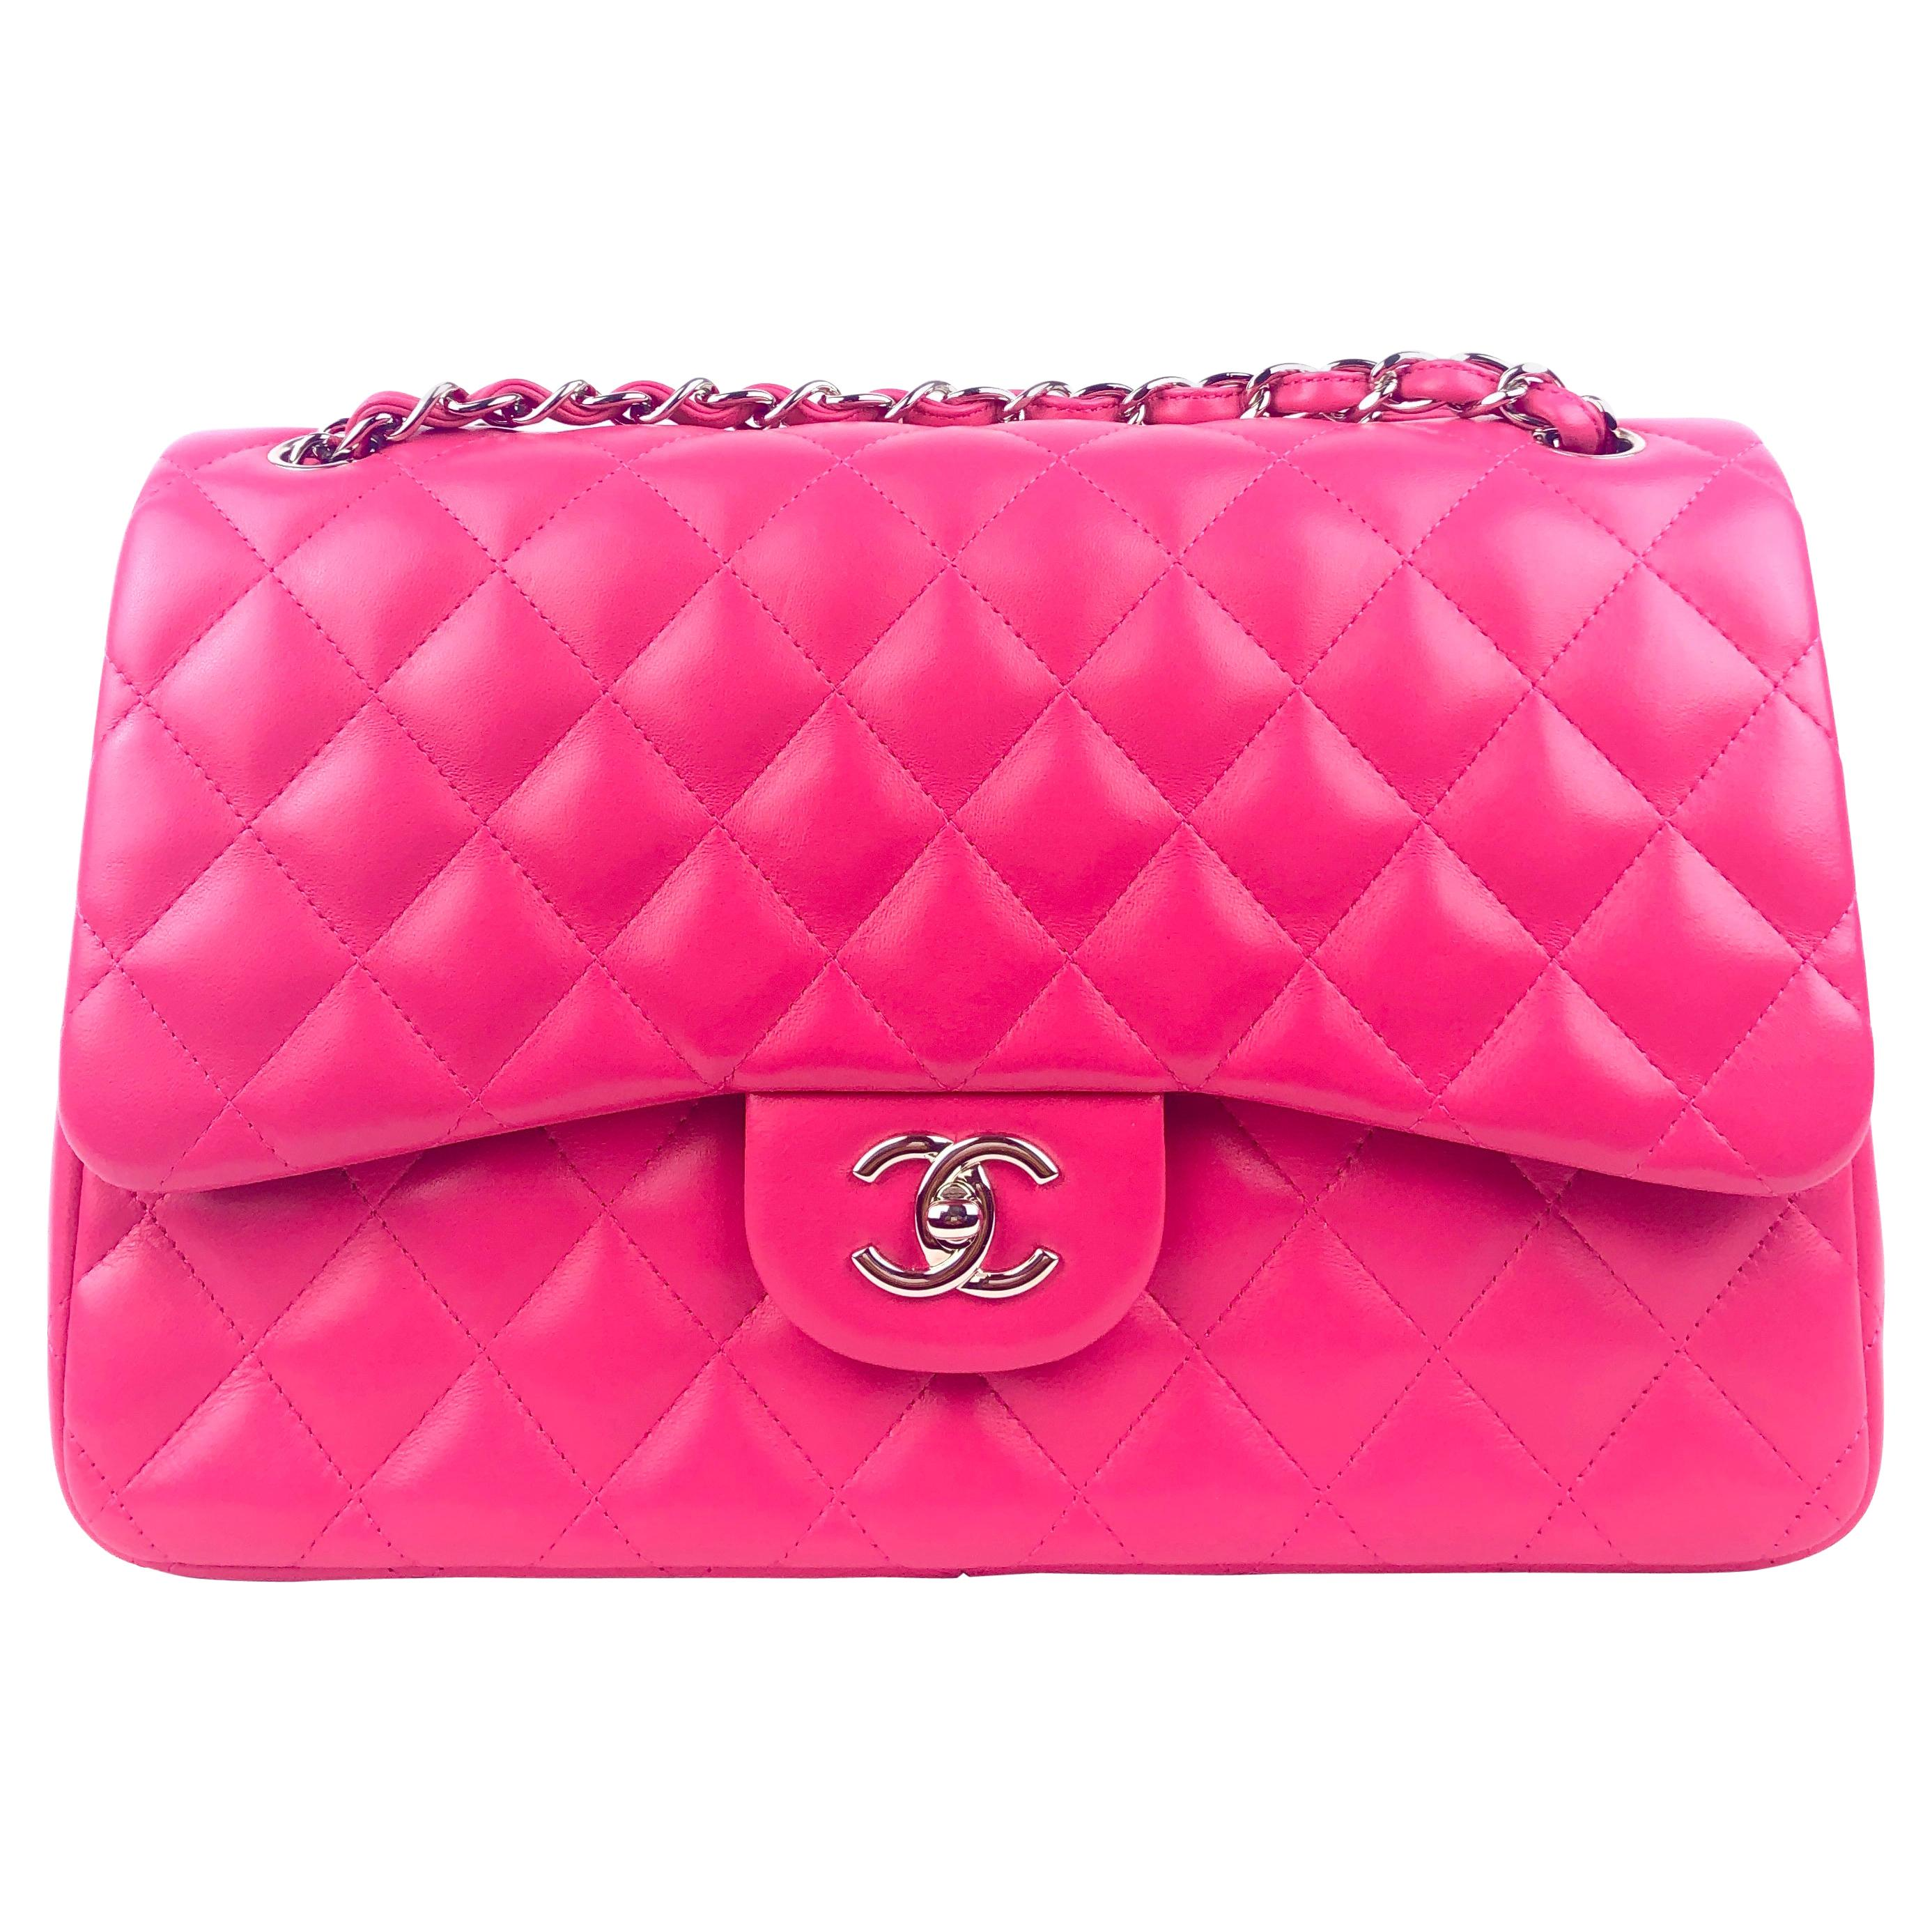 Chanel Fuschia Lambskin Jumbo Classic Double Flap Bag